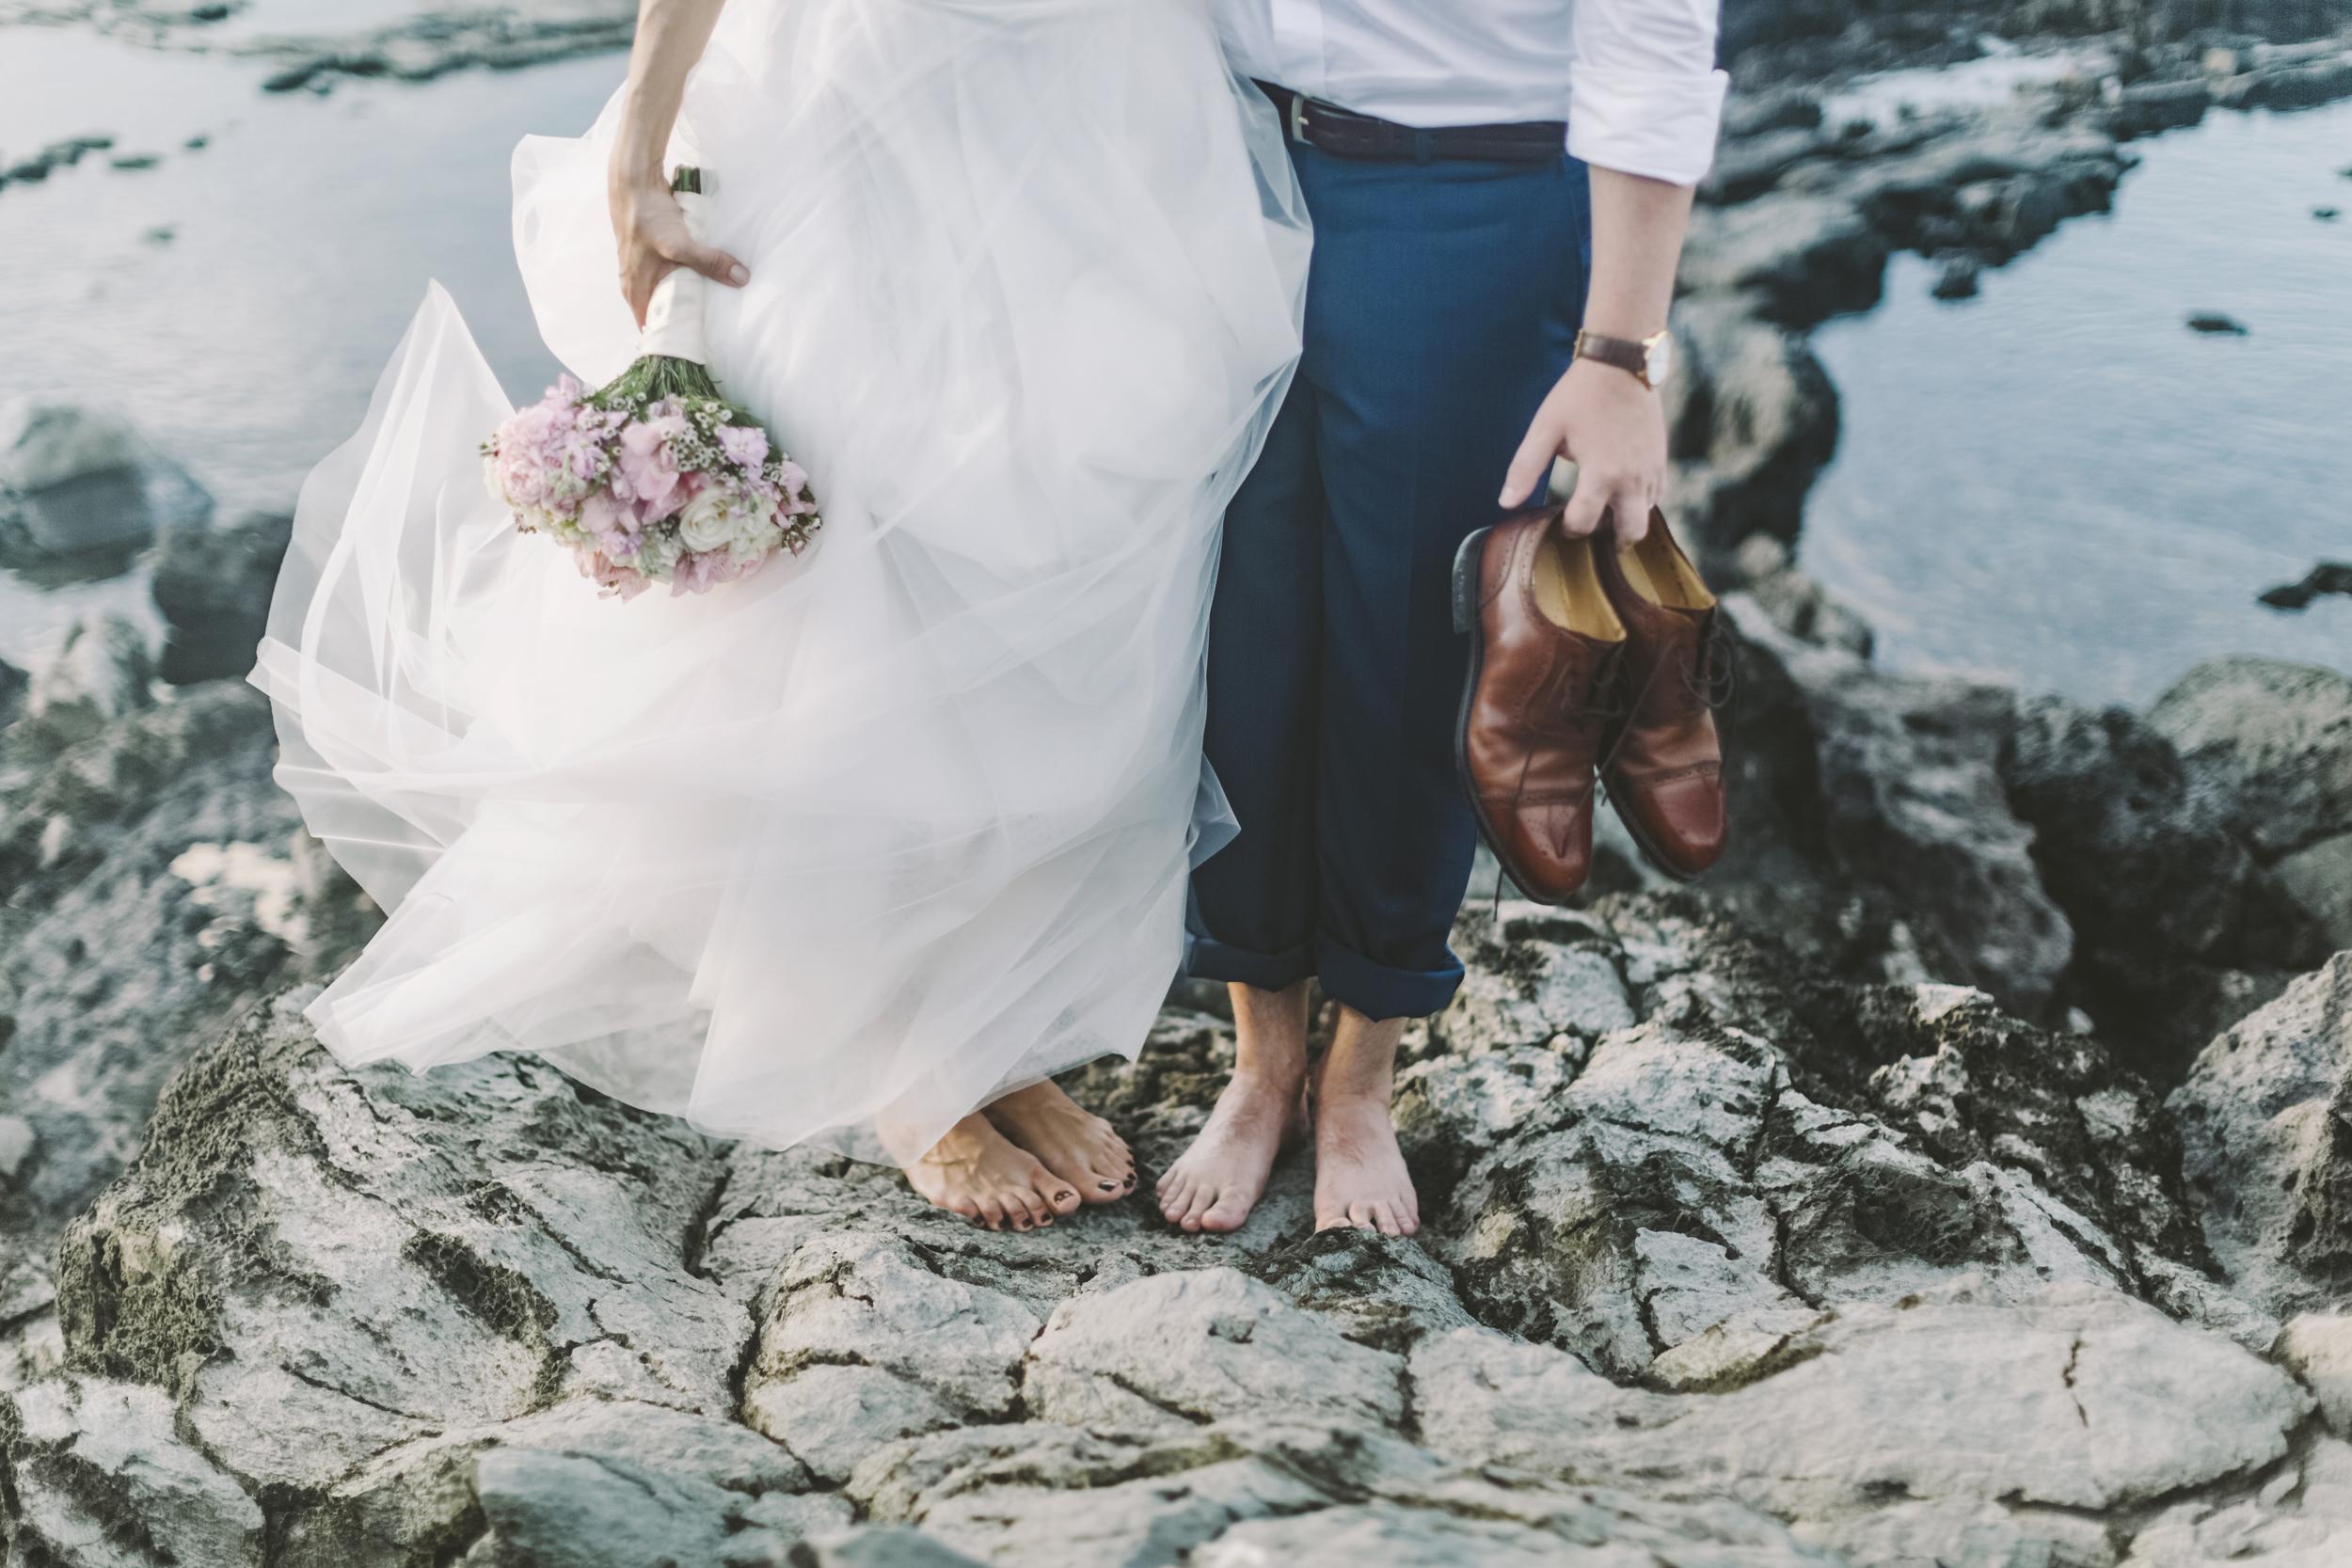 angie-diaz-photography-maui-wedding-ironwoods-beach-59.jpg